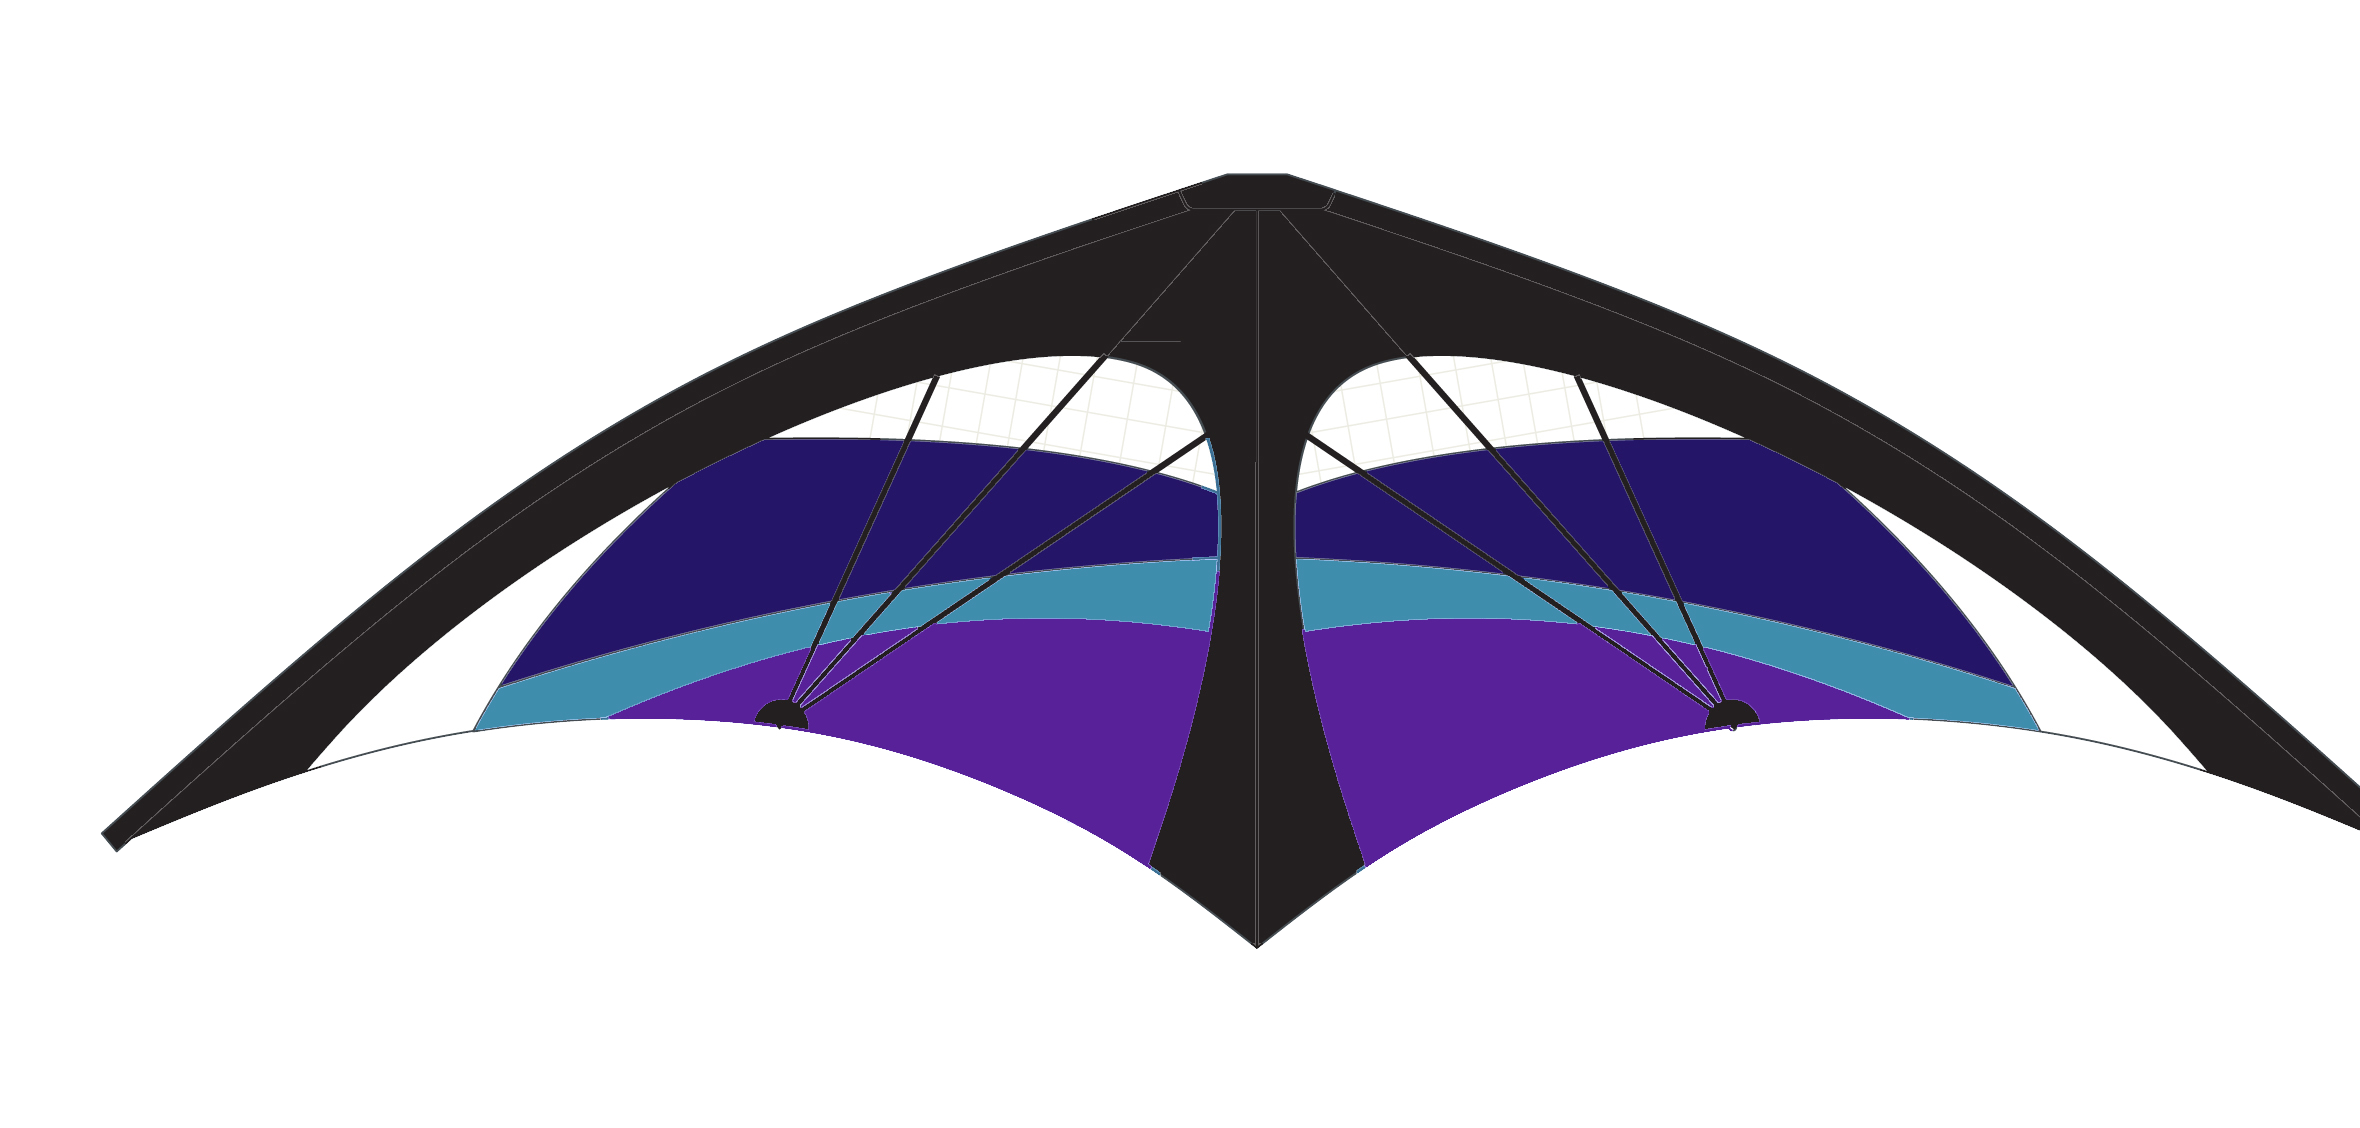 Kl phantom stunt blue. Kite clipart purple